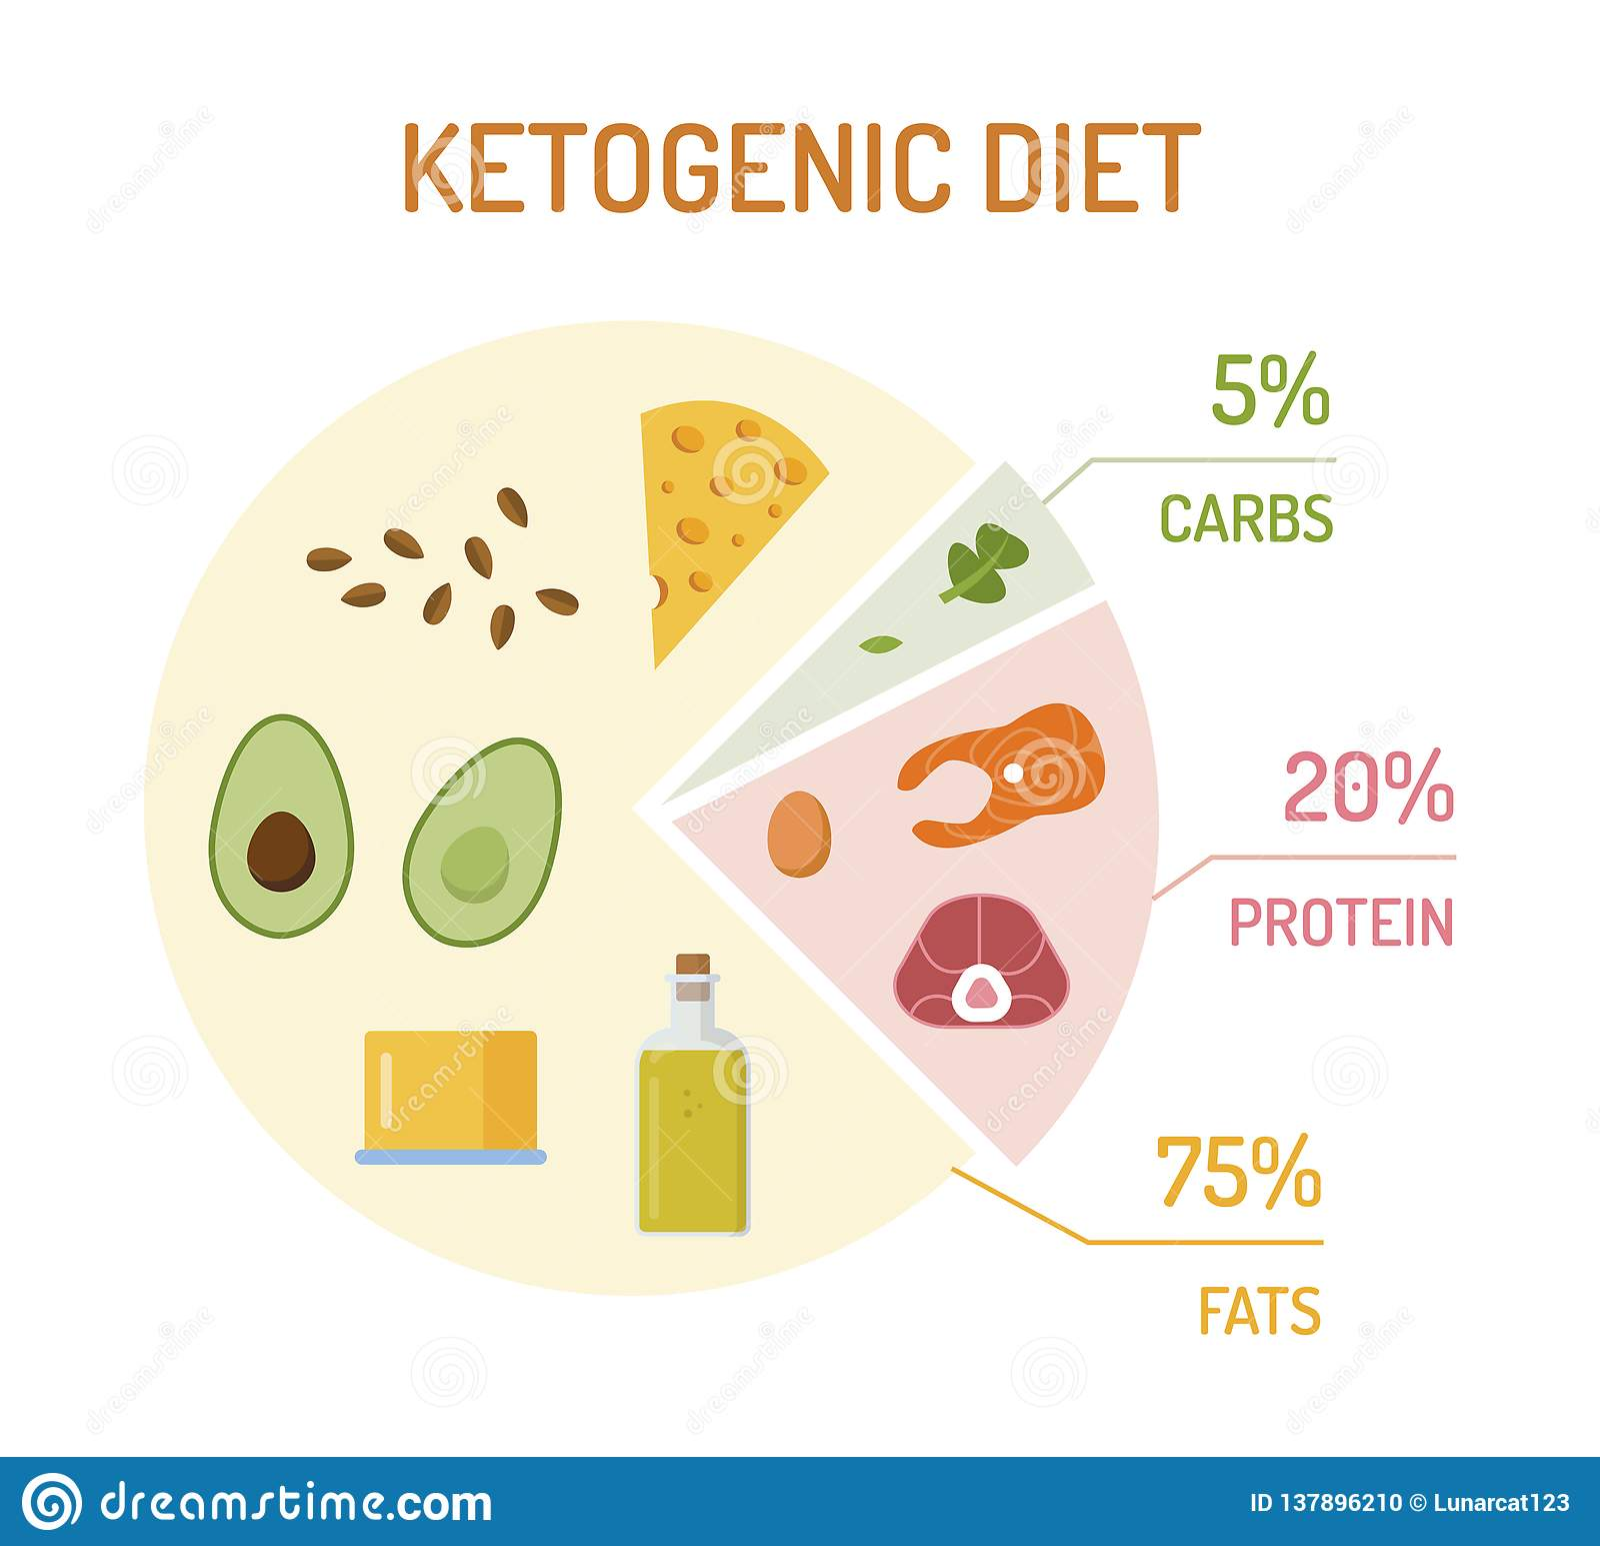 ketogenic diet protein percentage